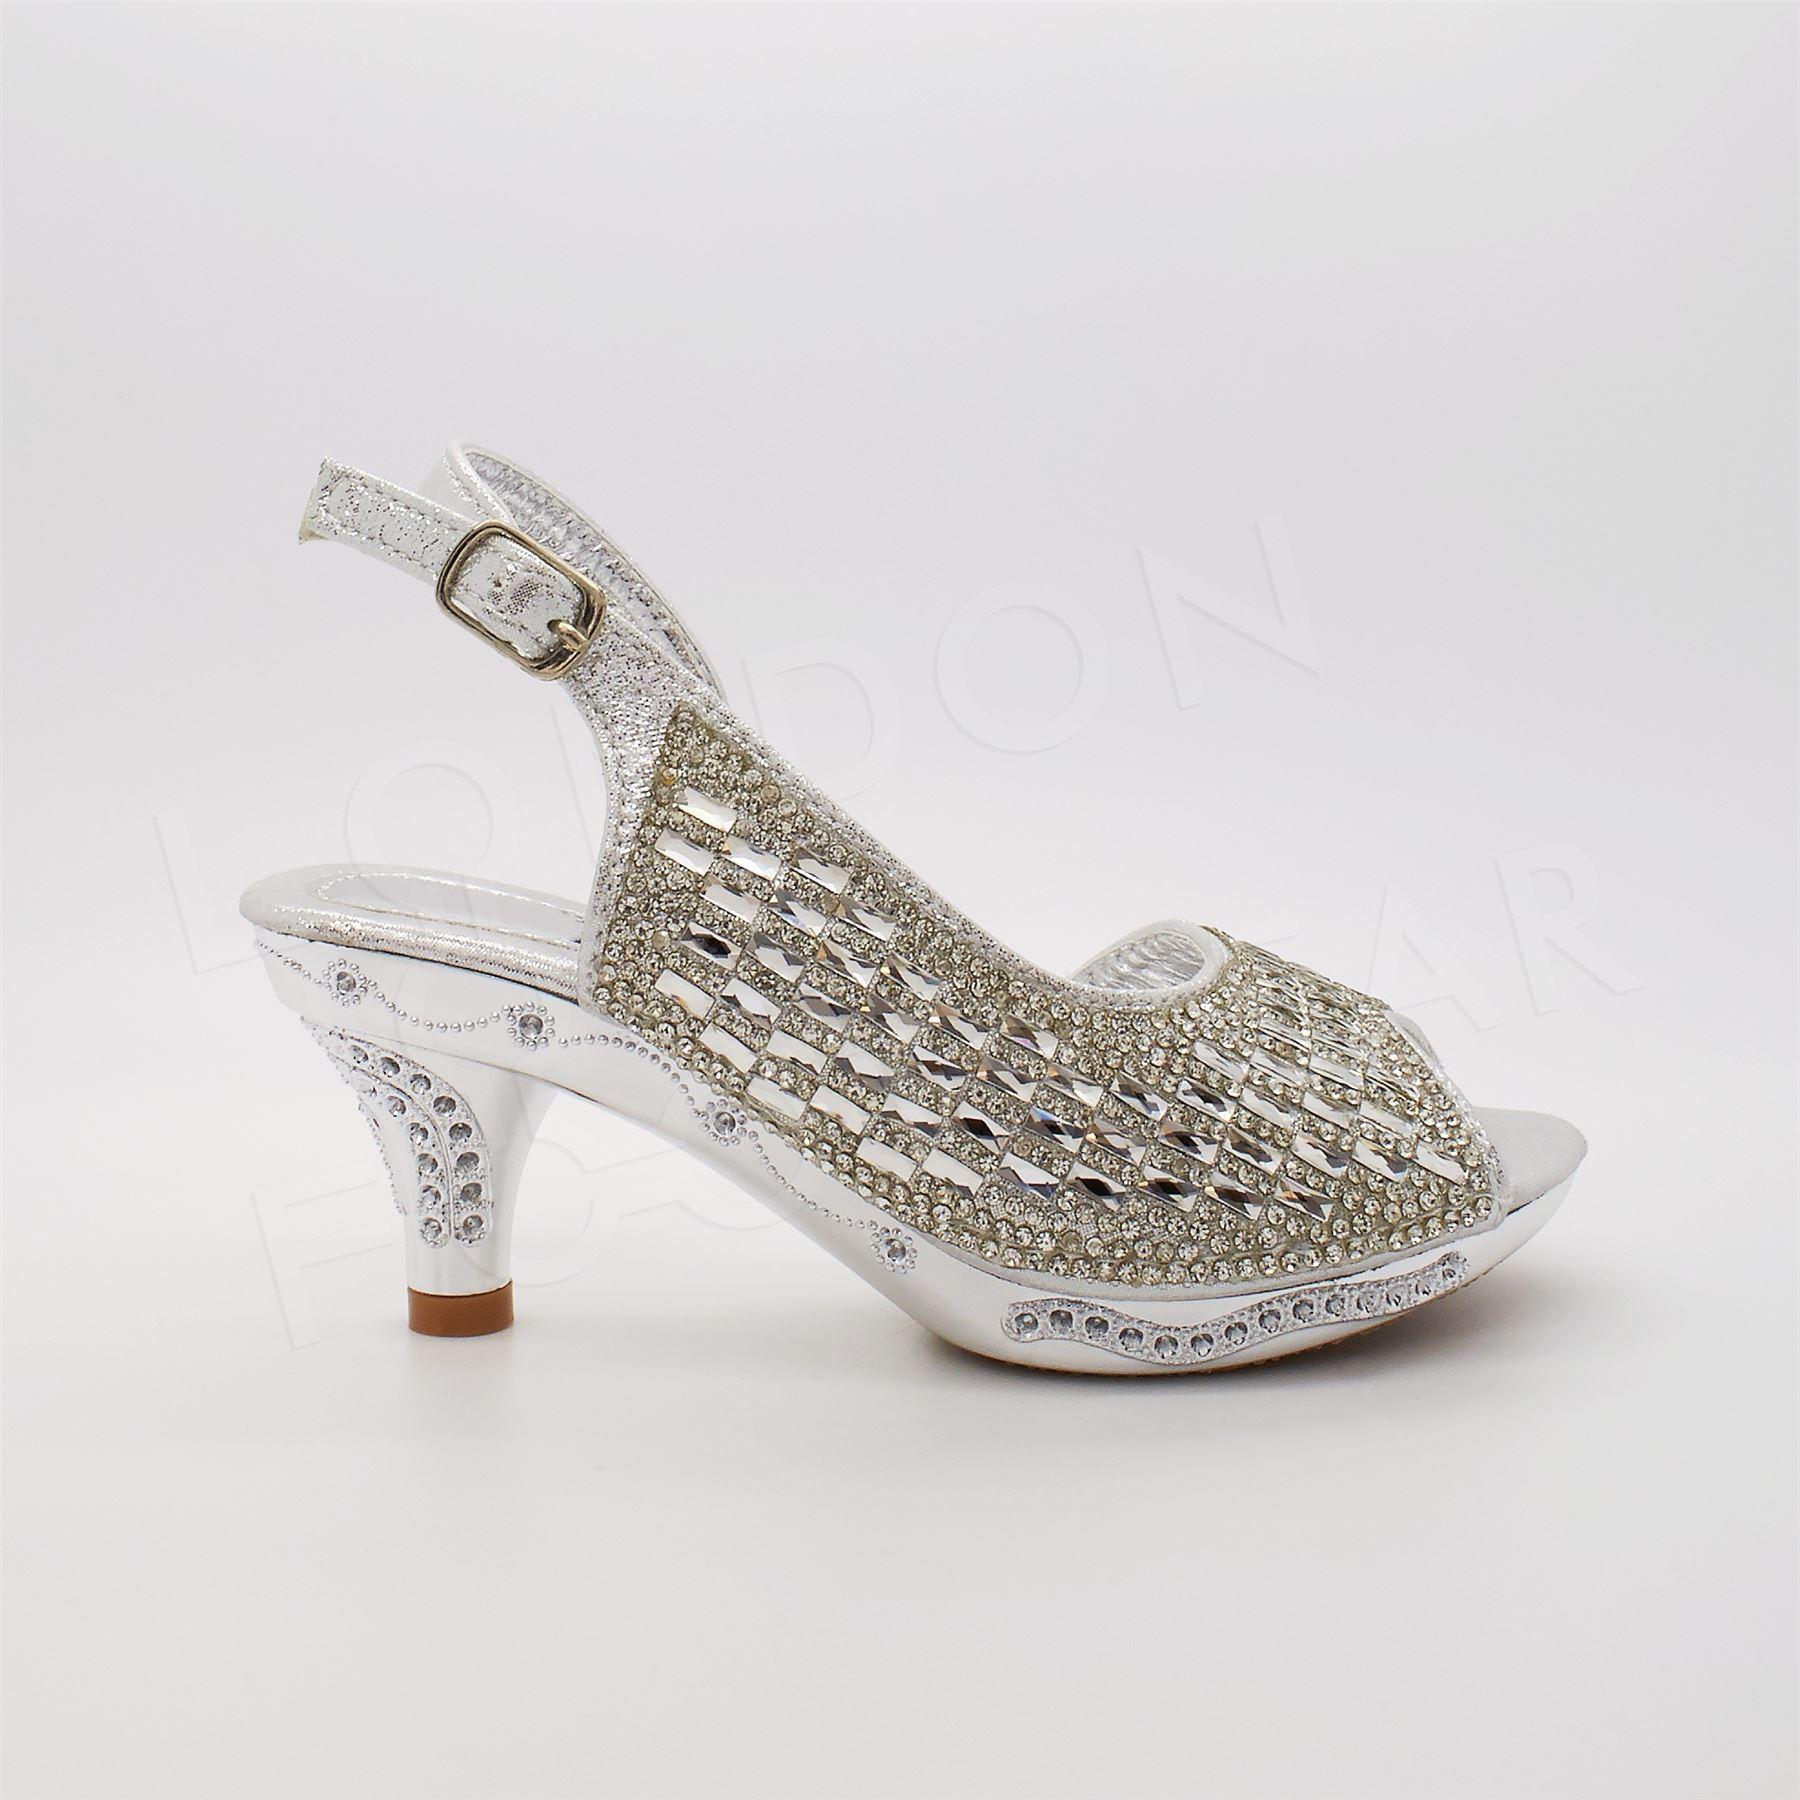 Girls Diamante Bridal Sandals Childrens Kids Wedding Party Low Kitten Heel Shoes